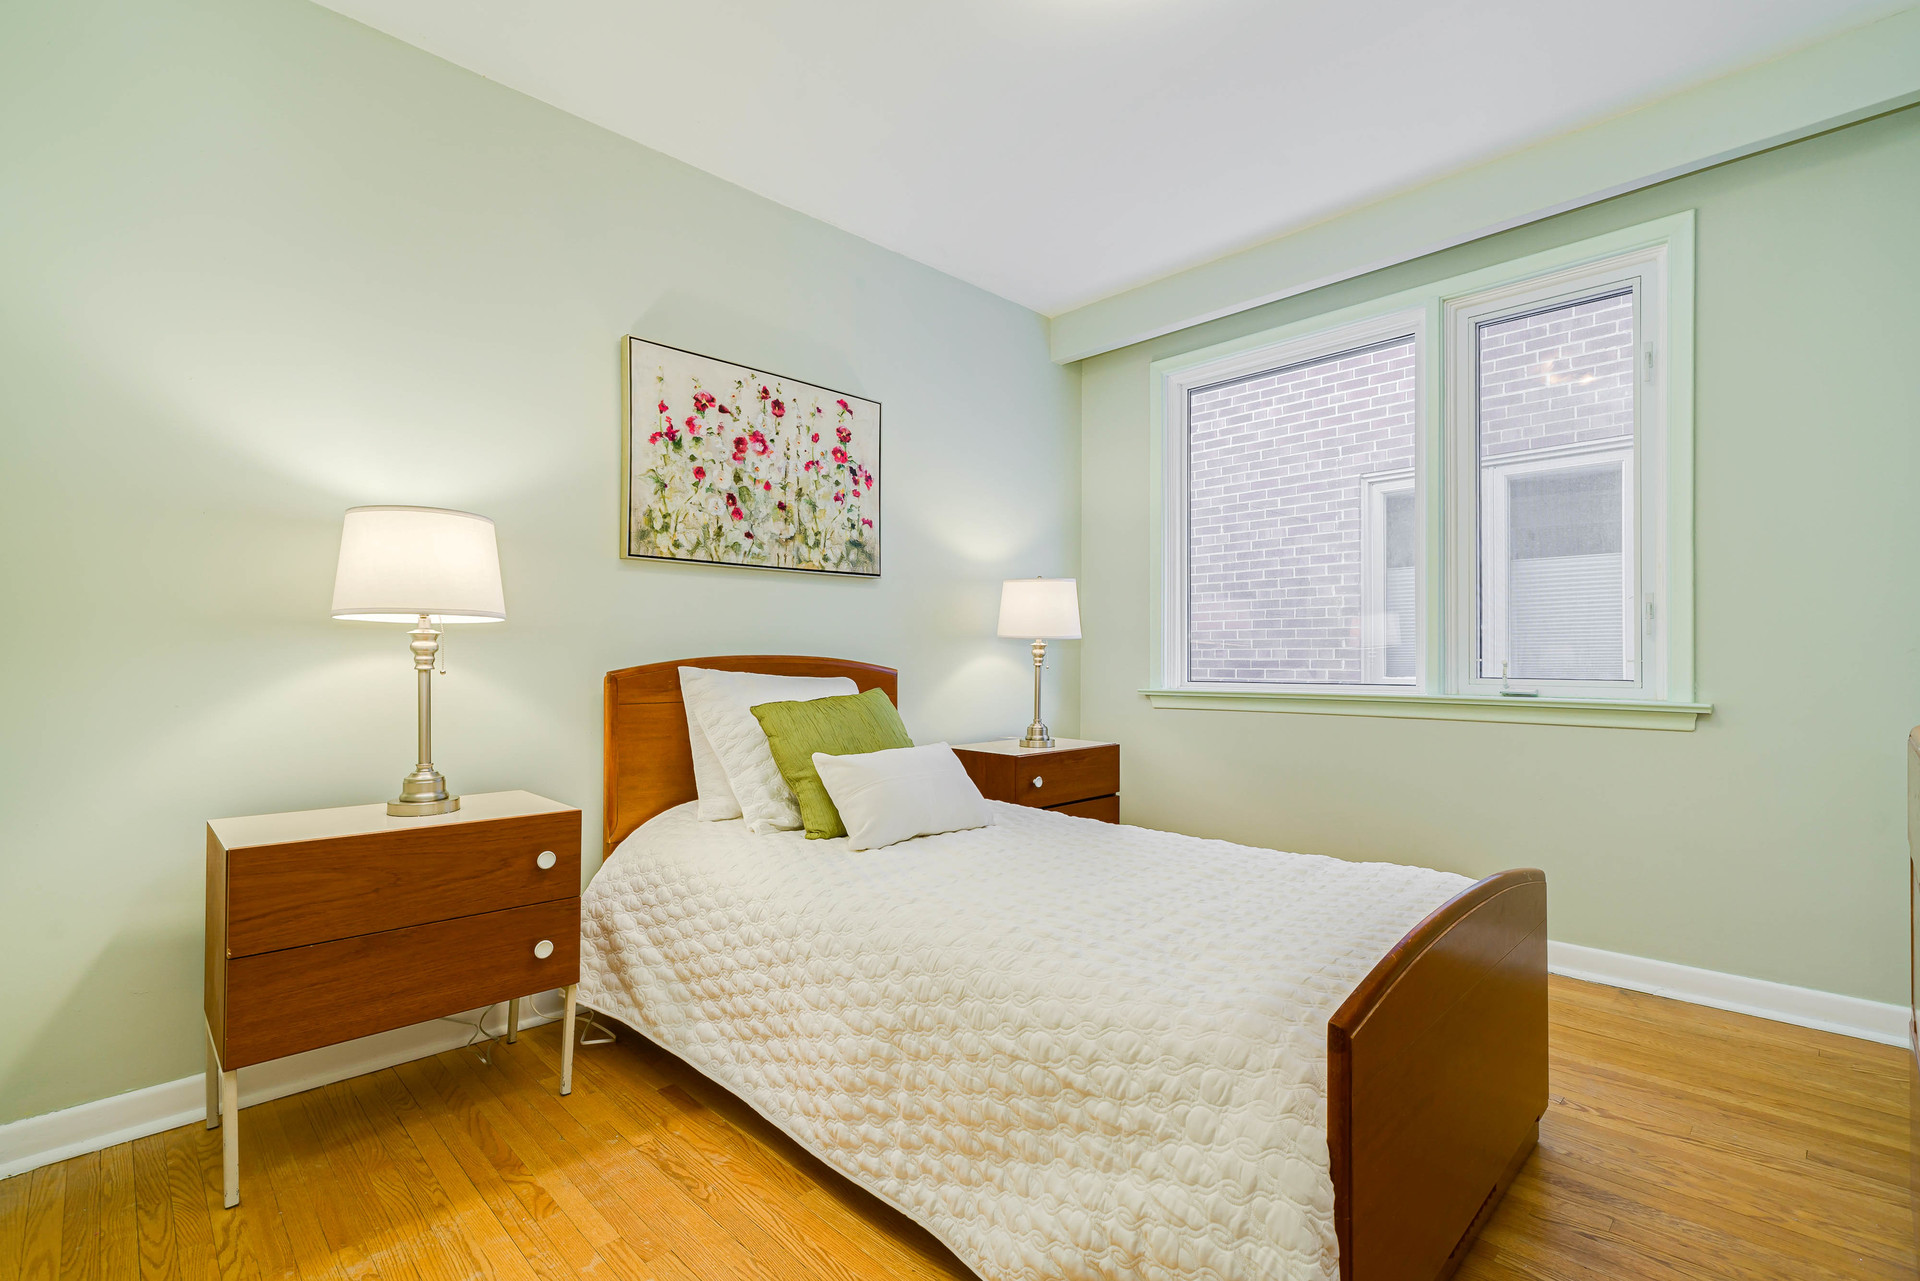 highres_028 at 38 Blithfield Avenue, Bayview Village, Toronto